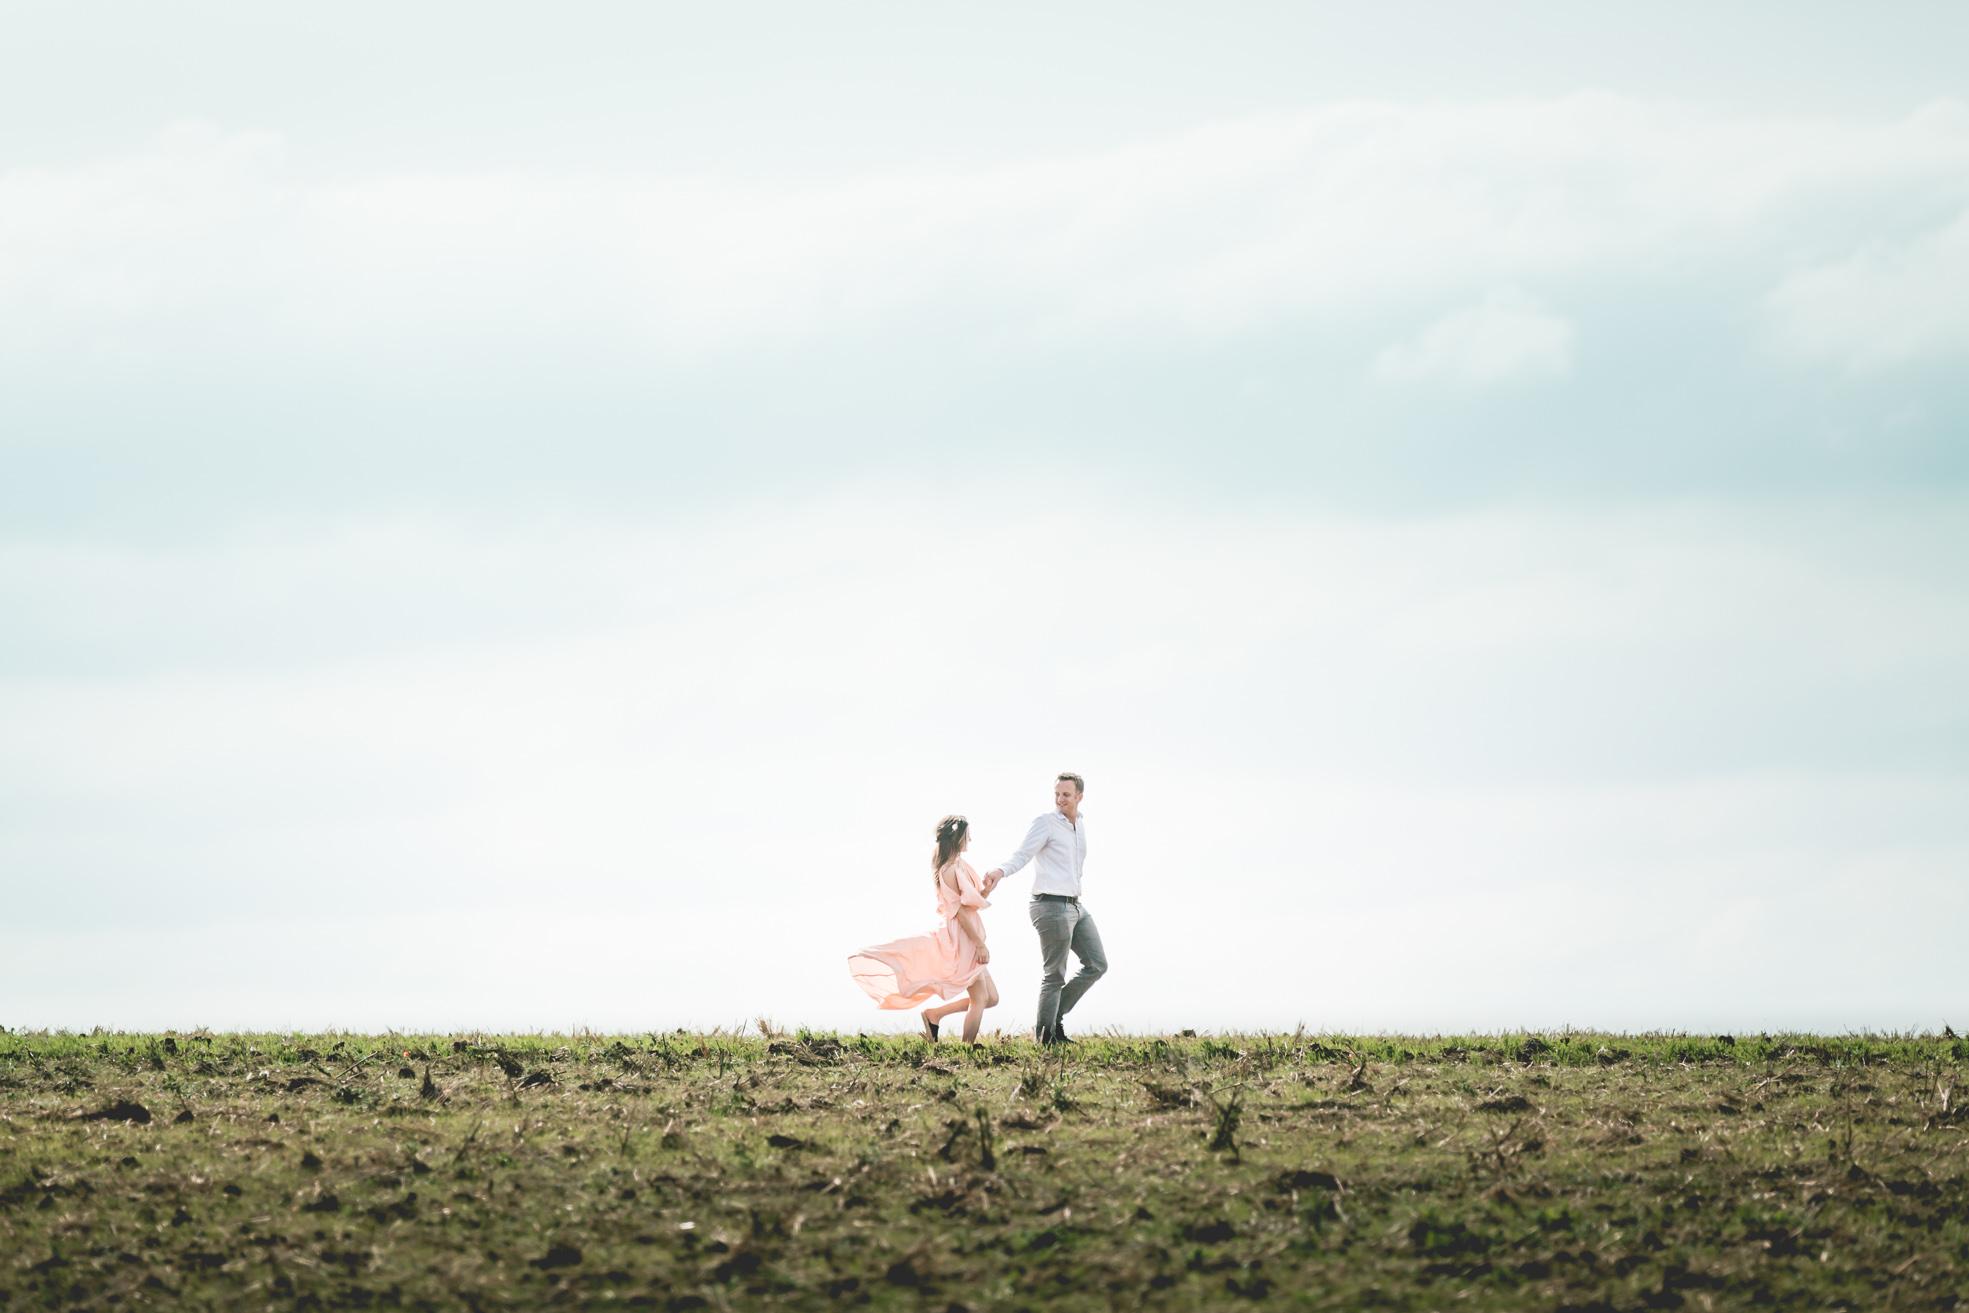 photographe mariage ile de france, jean-Baptiste Chauvin, photographe de mariage, photographe idf, www.studioart-photographe.fr, photographe mariage 75, photographe mariage Versailles, photographe mariage paris, photographe mariage